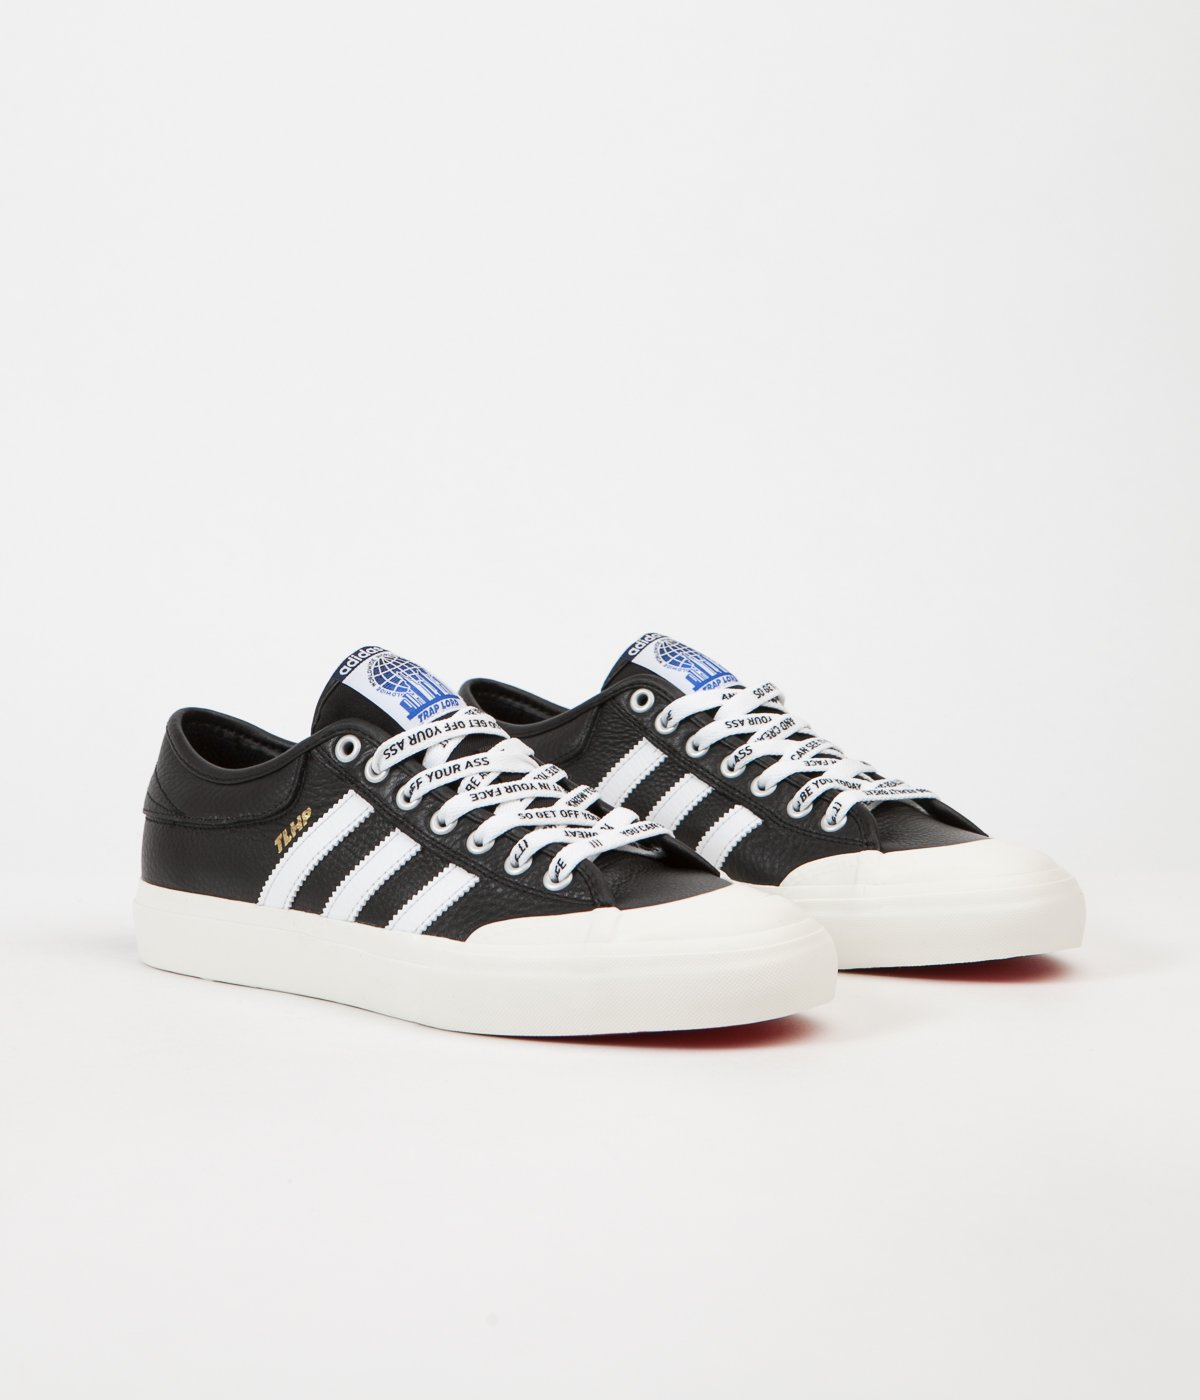 Aprendizaje Volver a llamar especificar  Very Goods | Adidas x Trap Lord Ferg Matchcourt Shoes - Black / White |  Flatspot